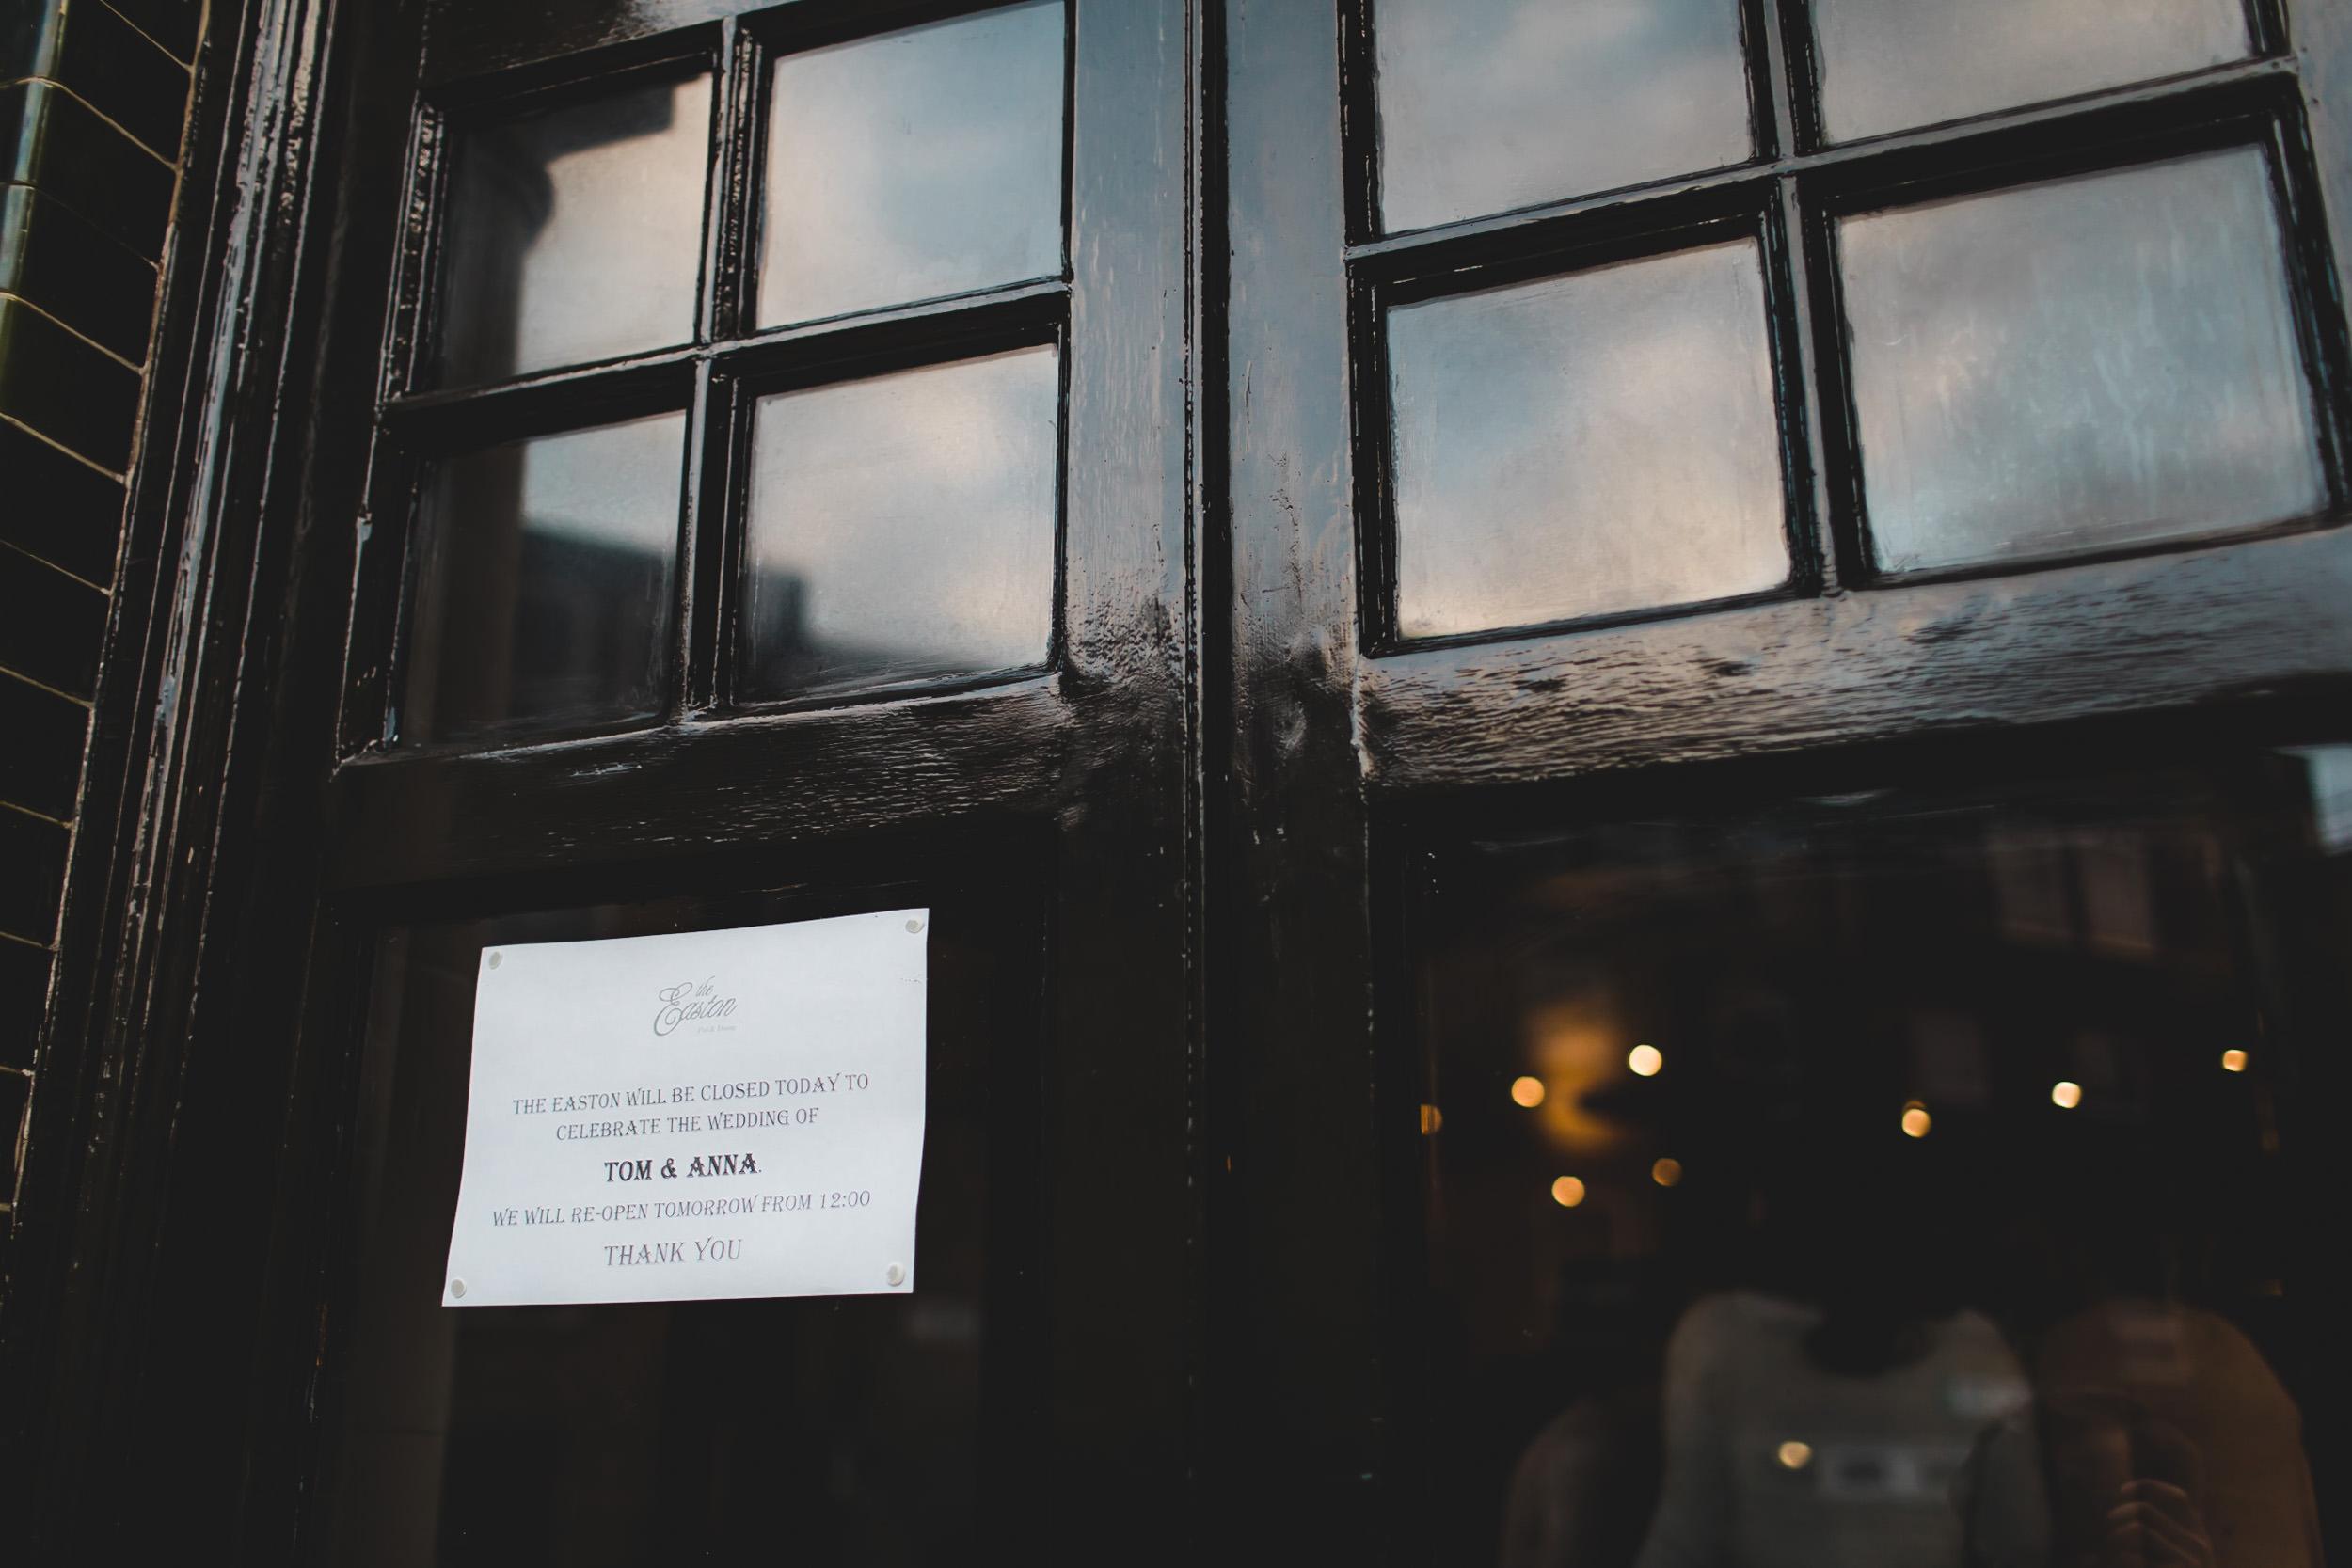 easton pub private function closed london